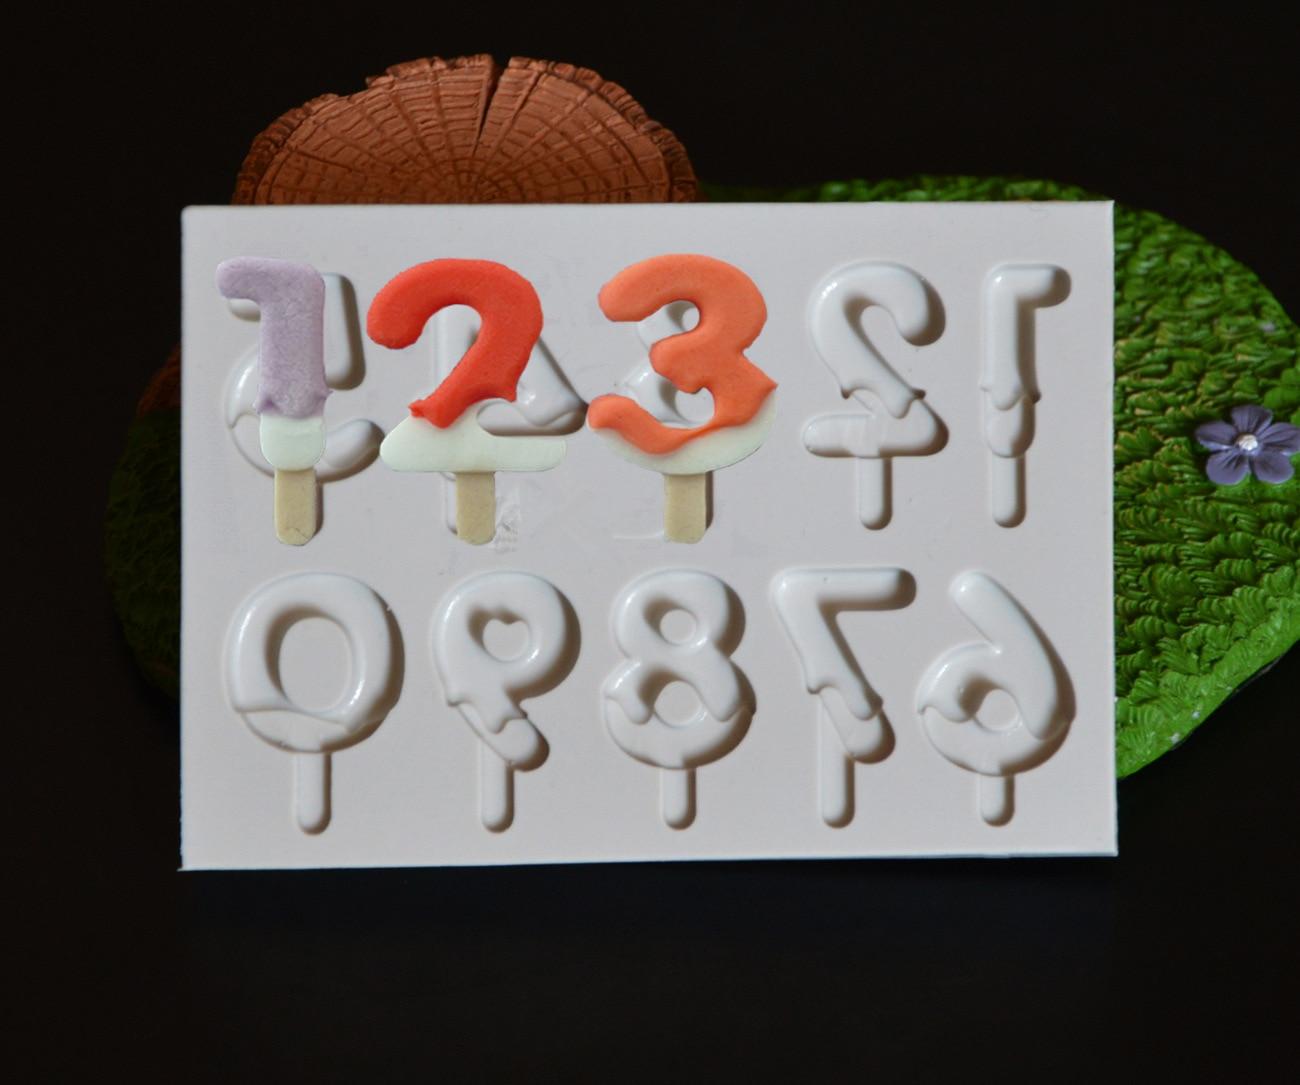 Nuevo Número de Silicona Piruleta Moldes Fondant Cake Decorating Herramientas de